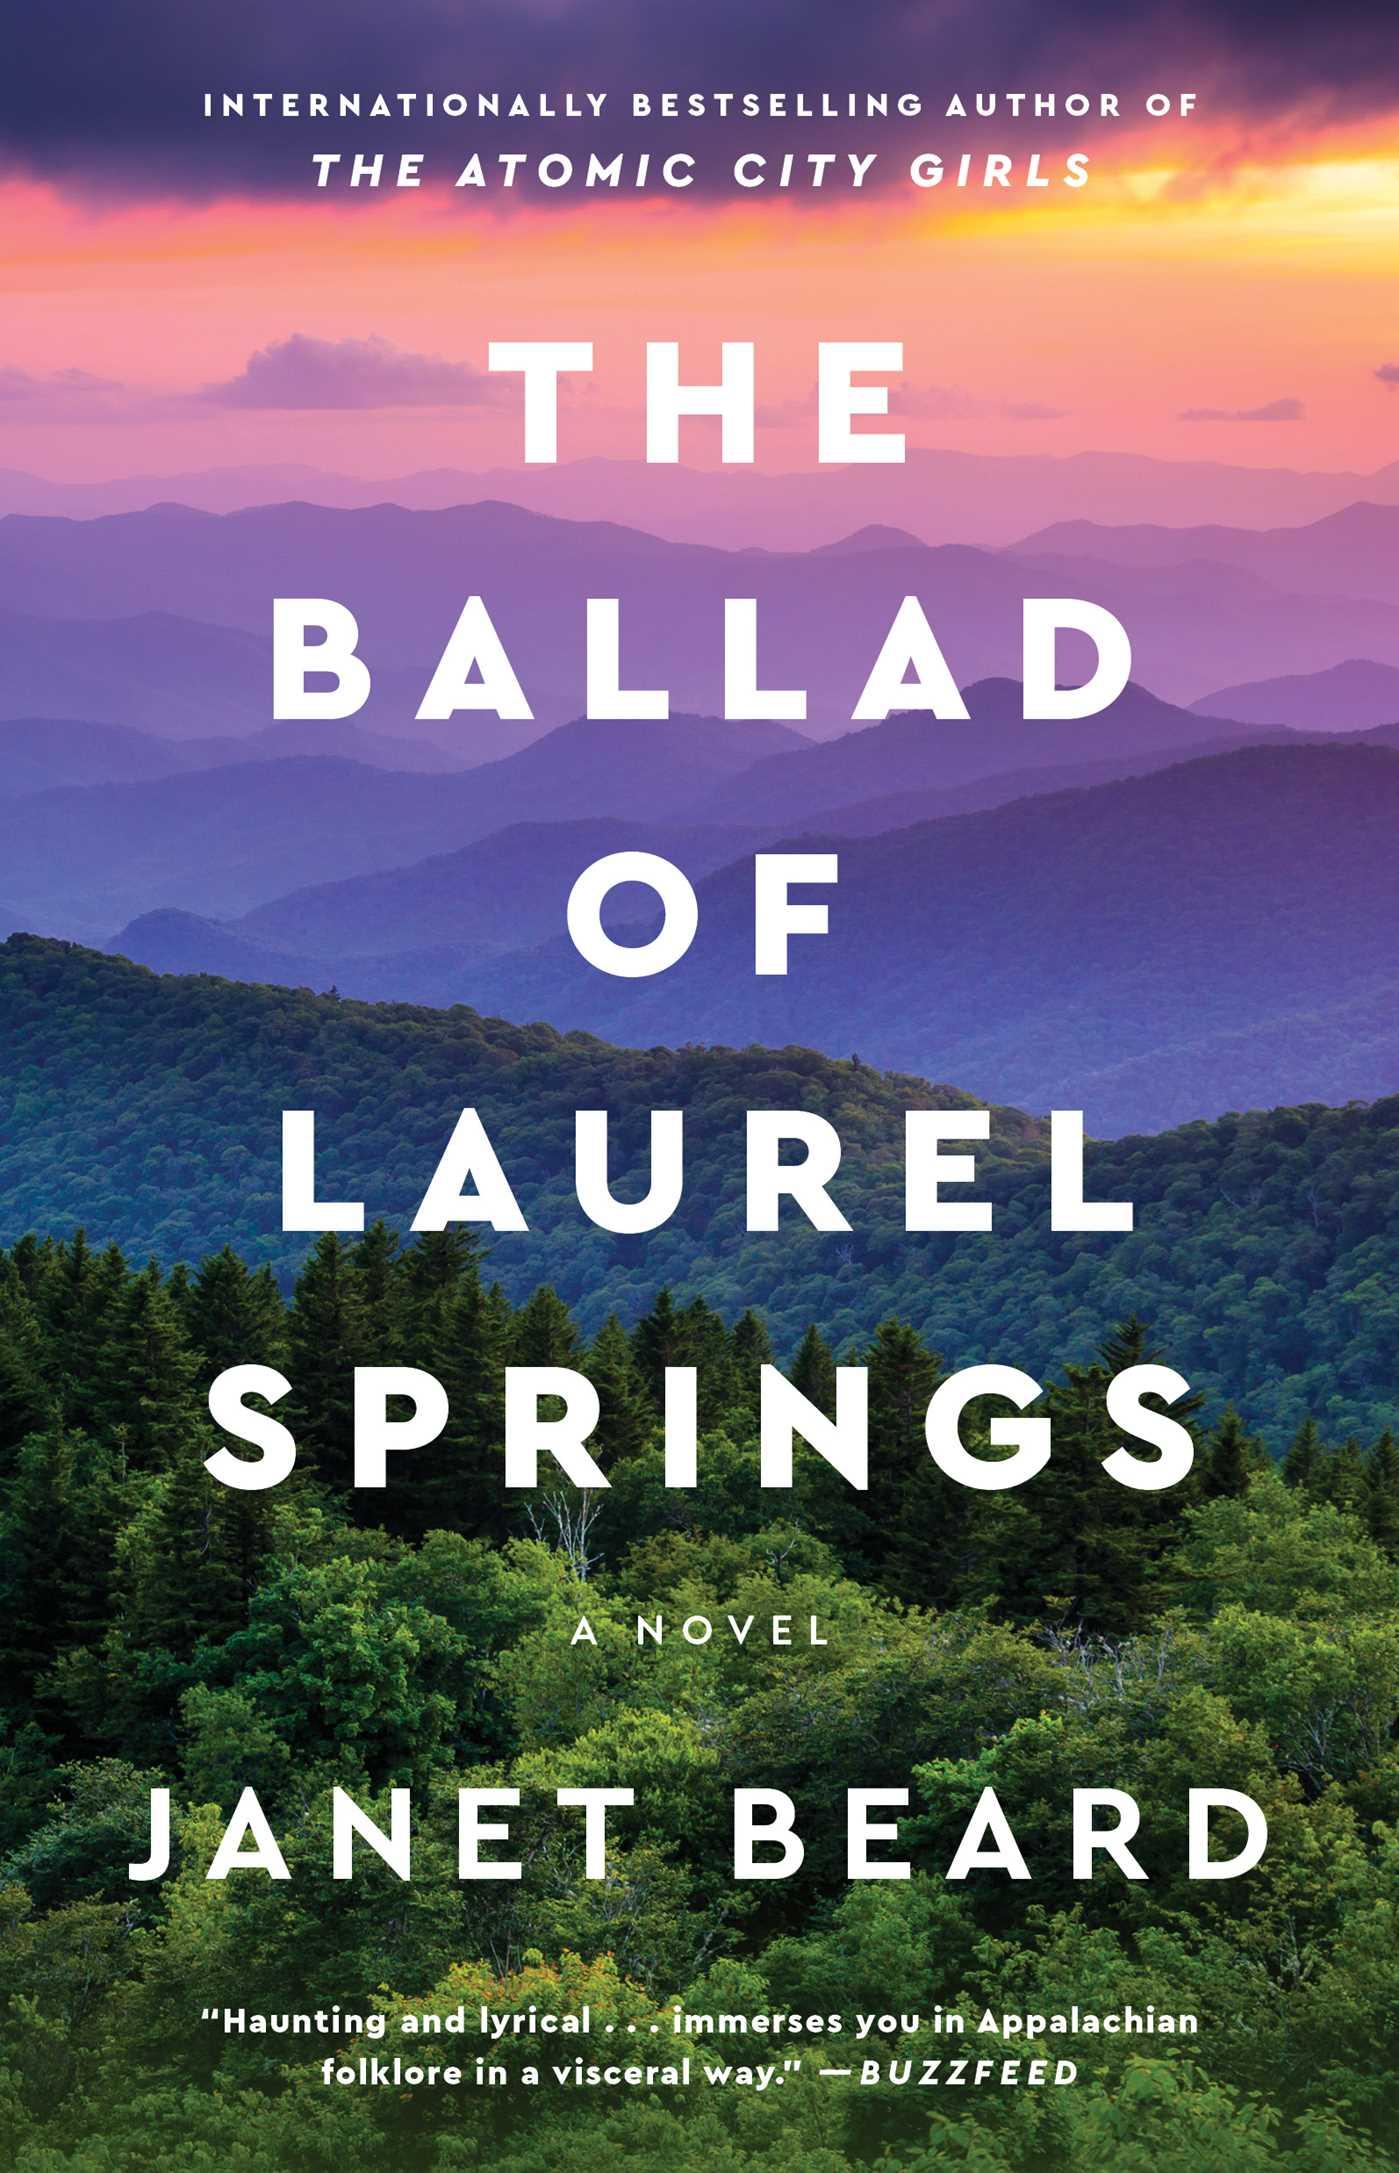 The Ballad of Laurel Springs